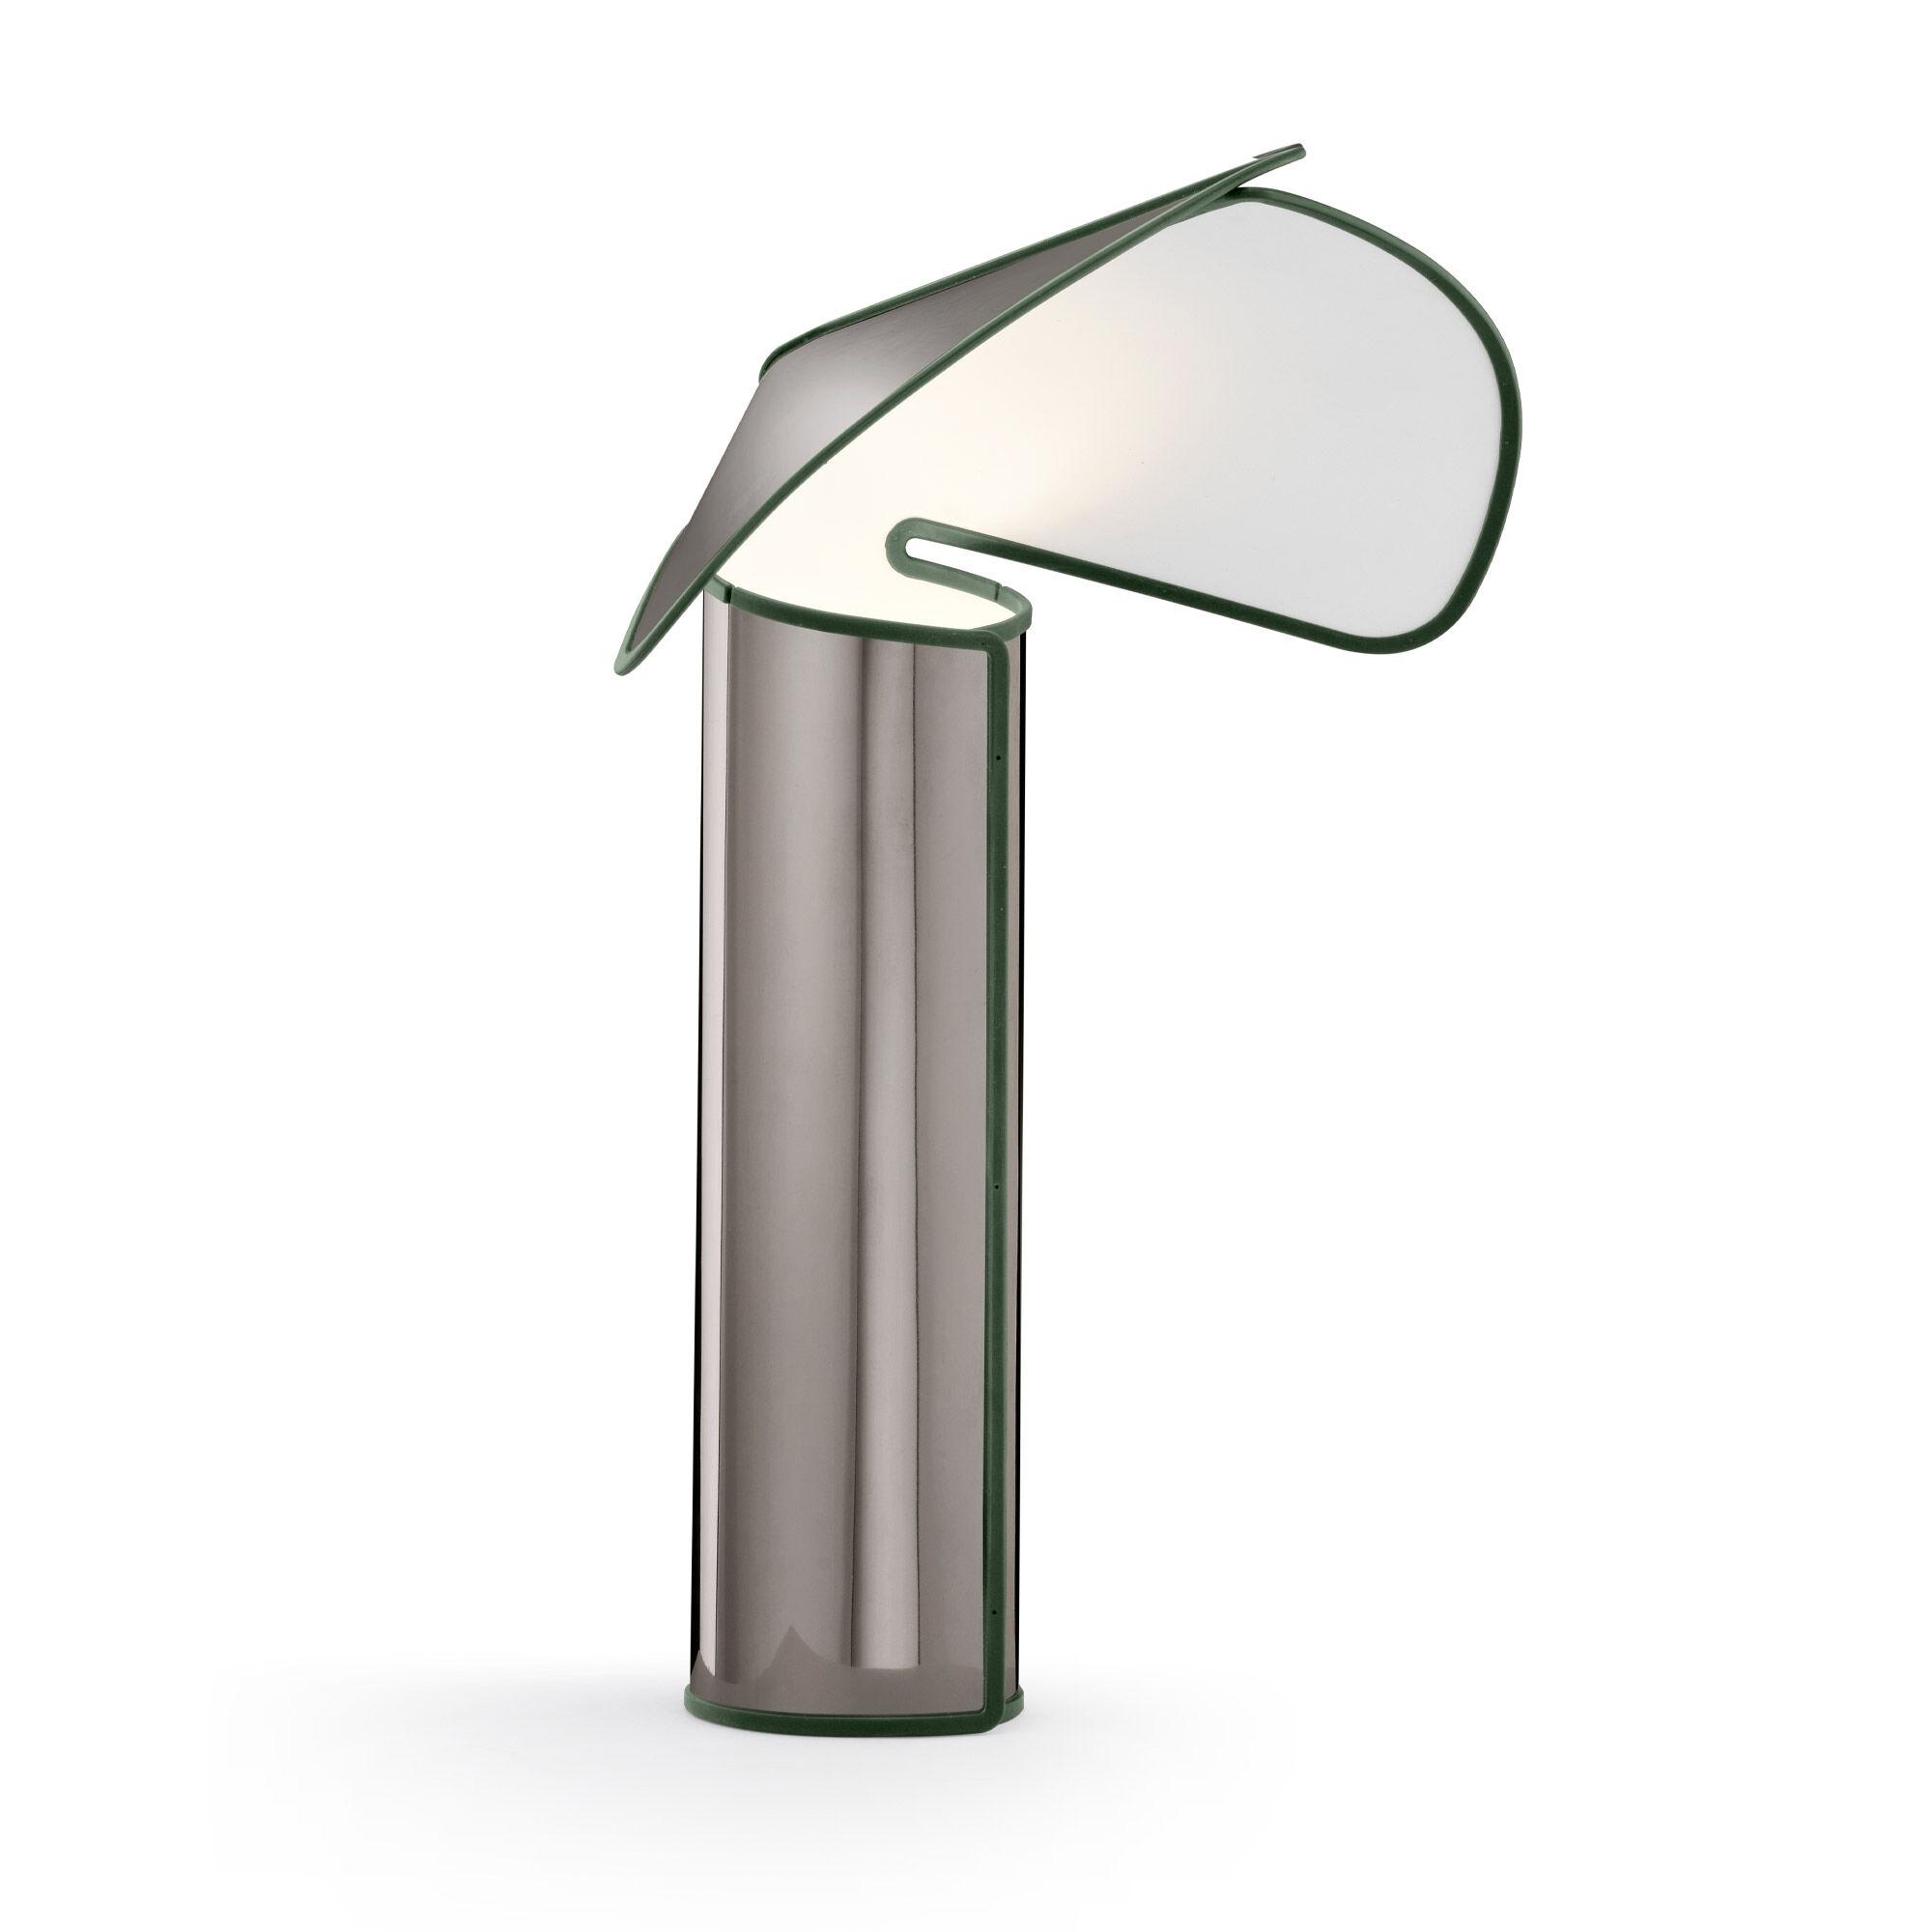 Flos Chiara Table Lamp Dark Grey / Olive Green